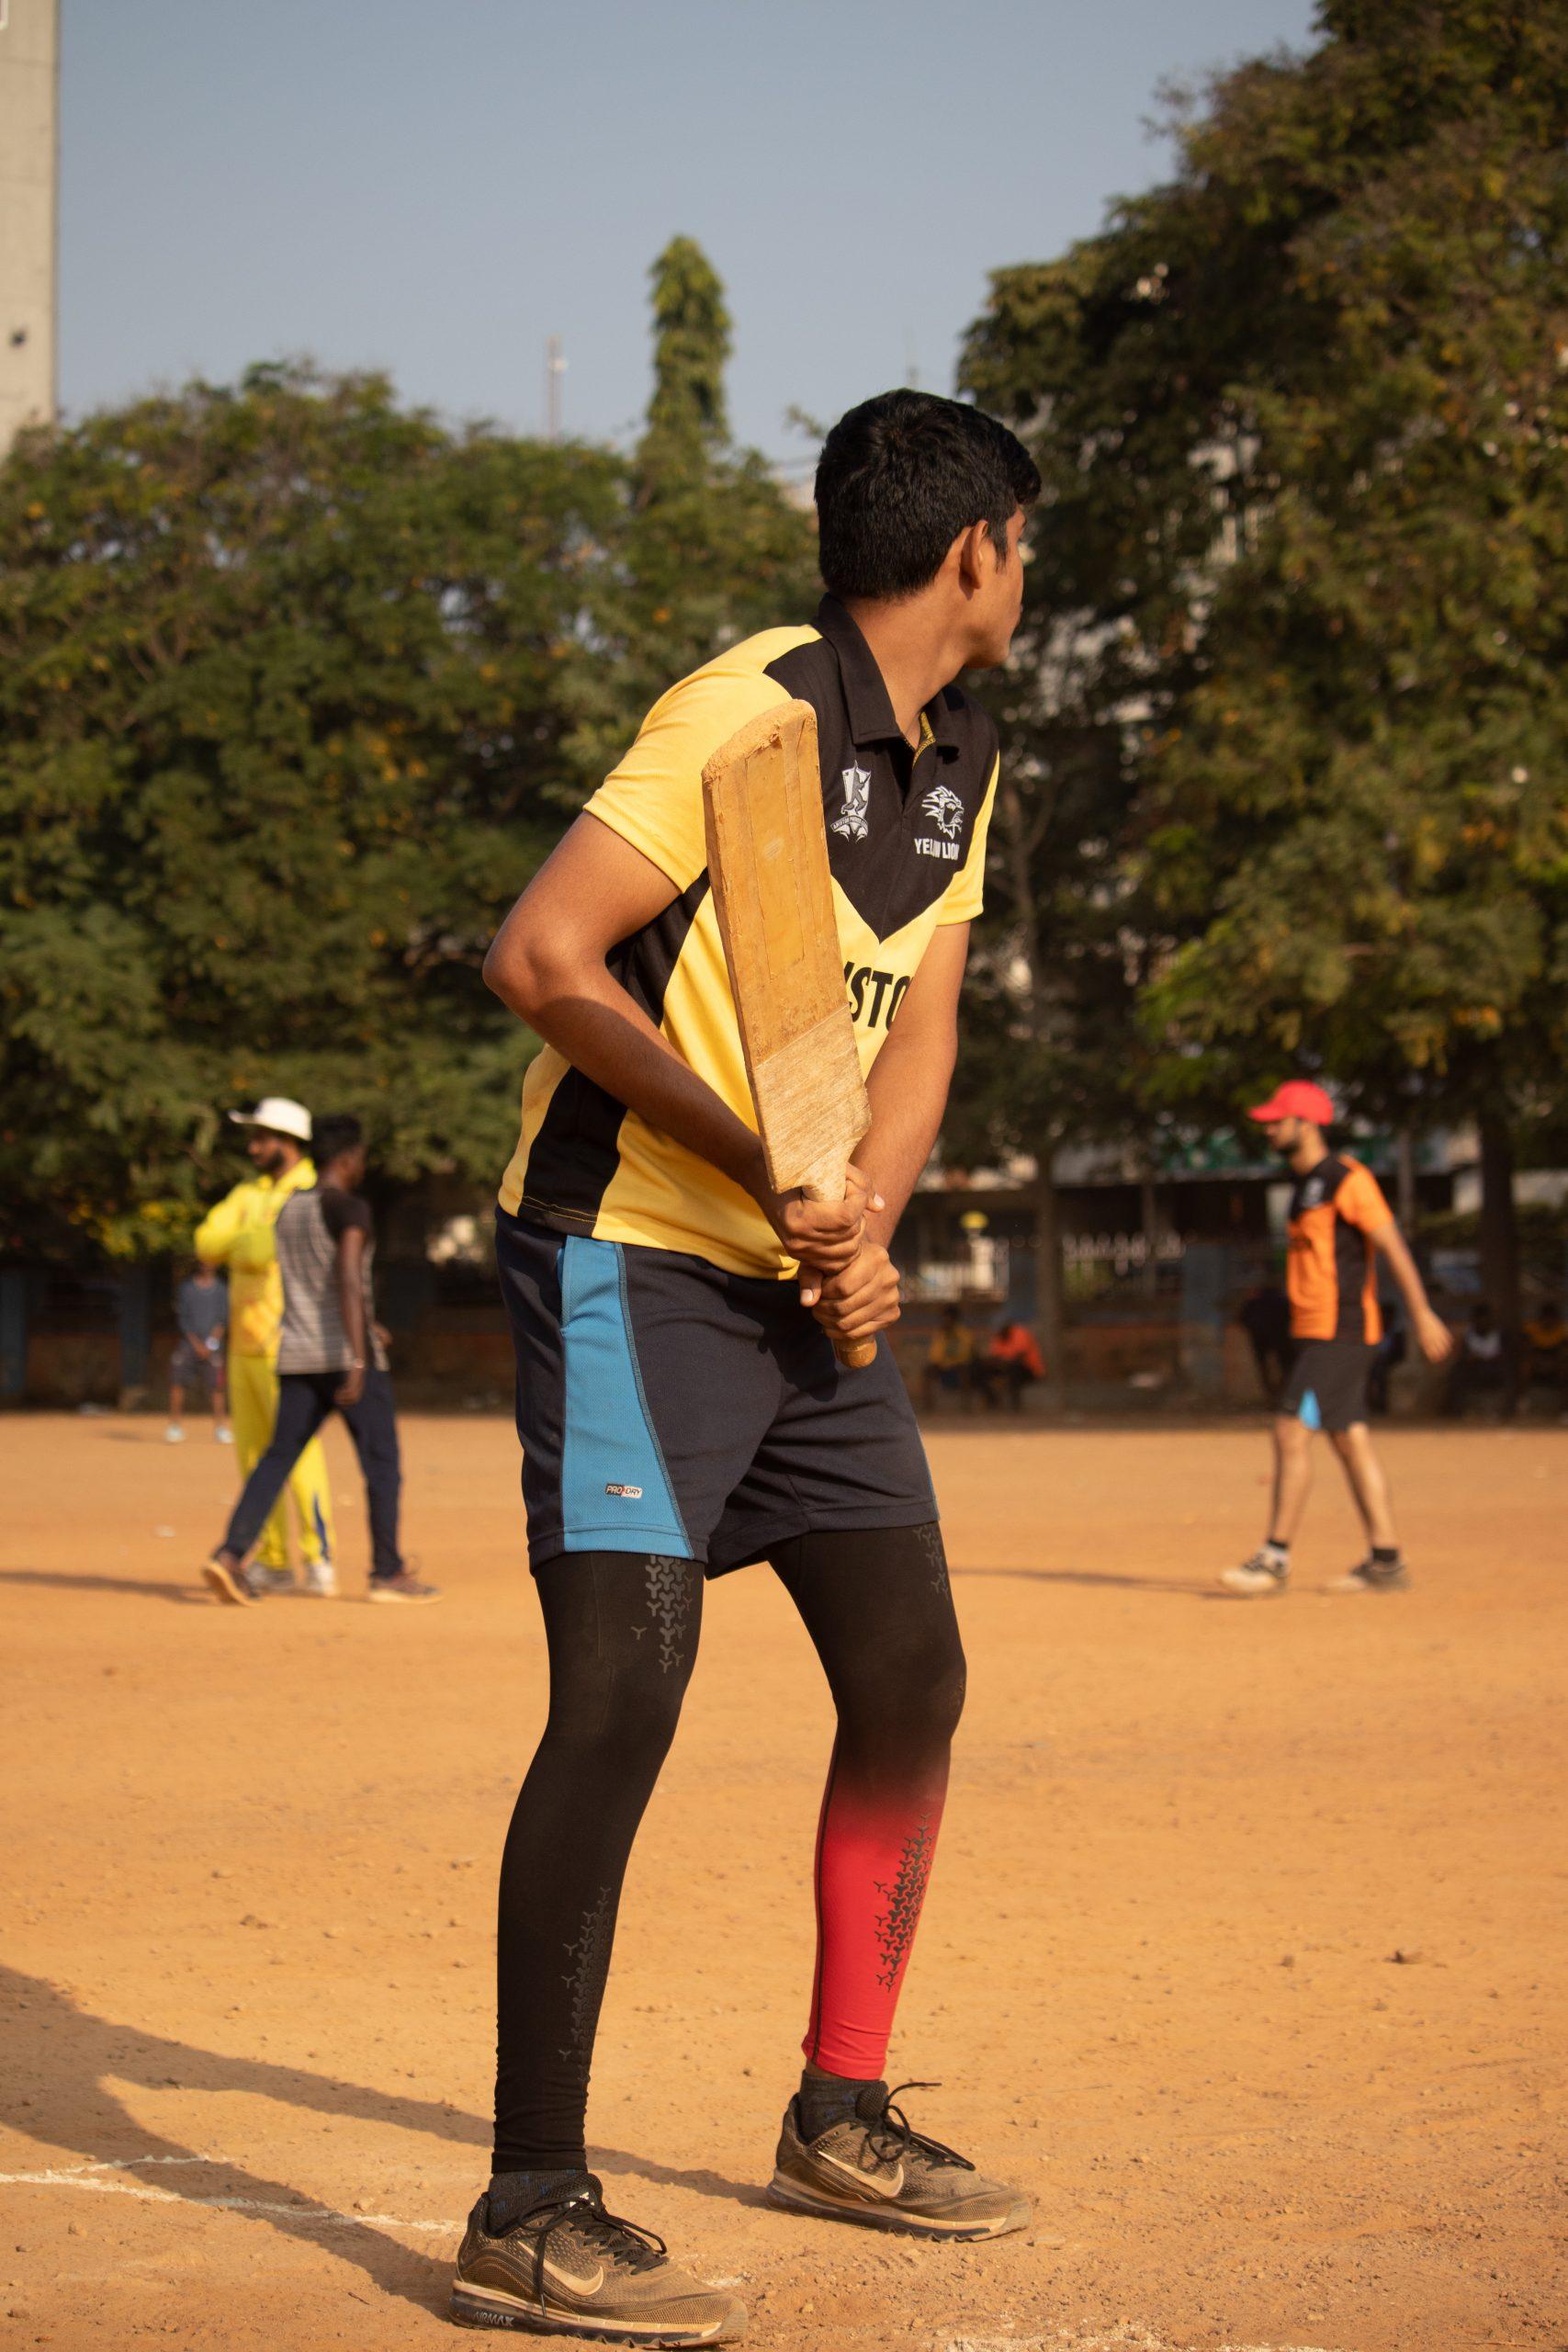 Batsman practicing before match